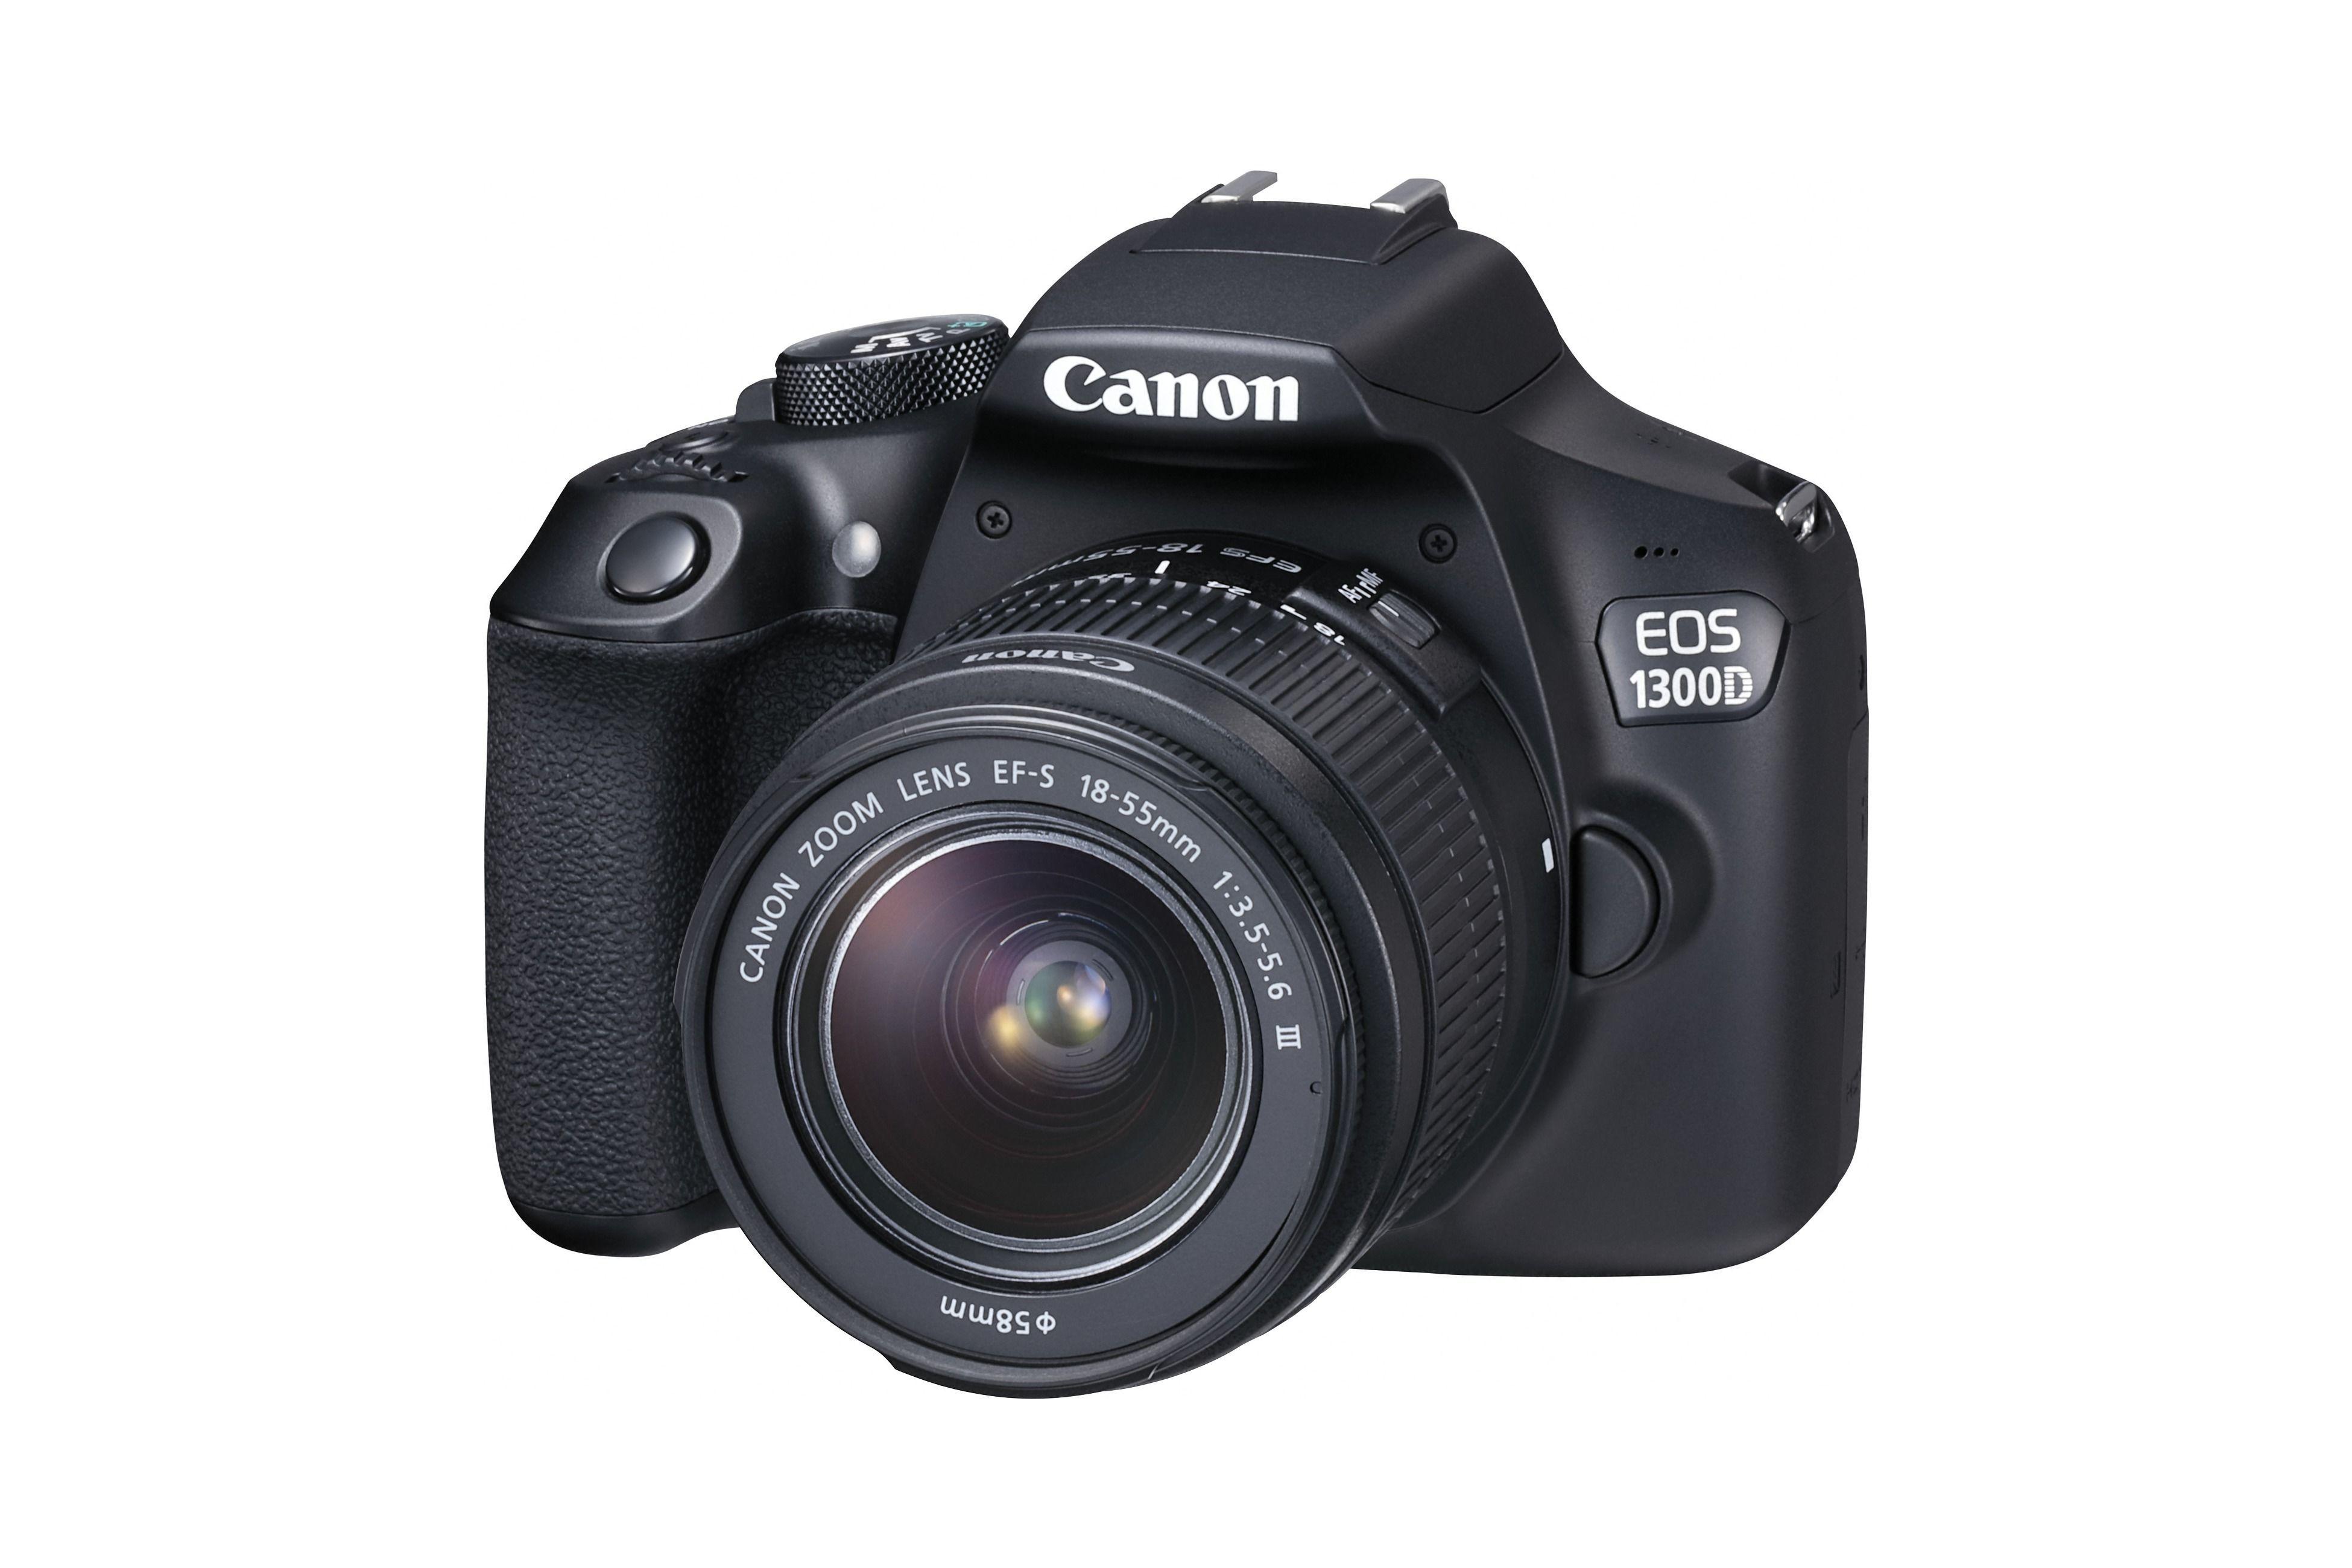 Appareil Photo Reflex - 1300D avec objectif 18-55